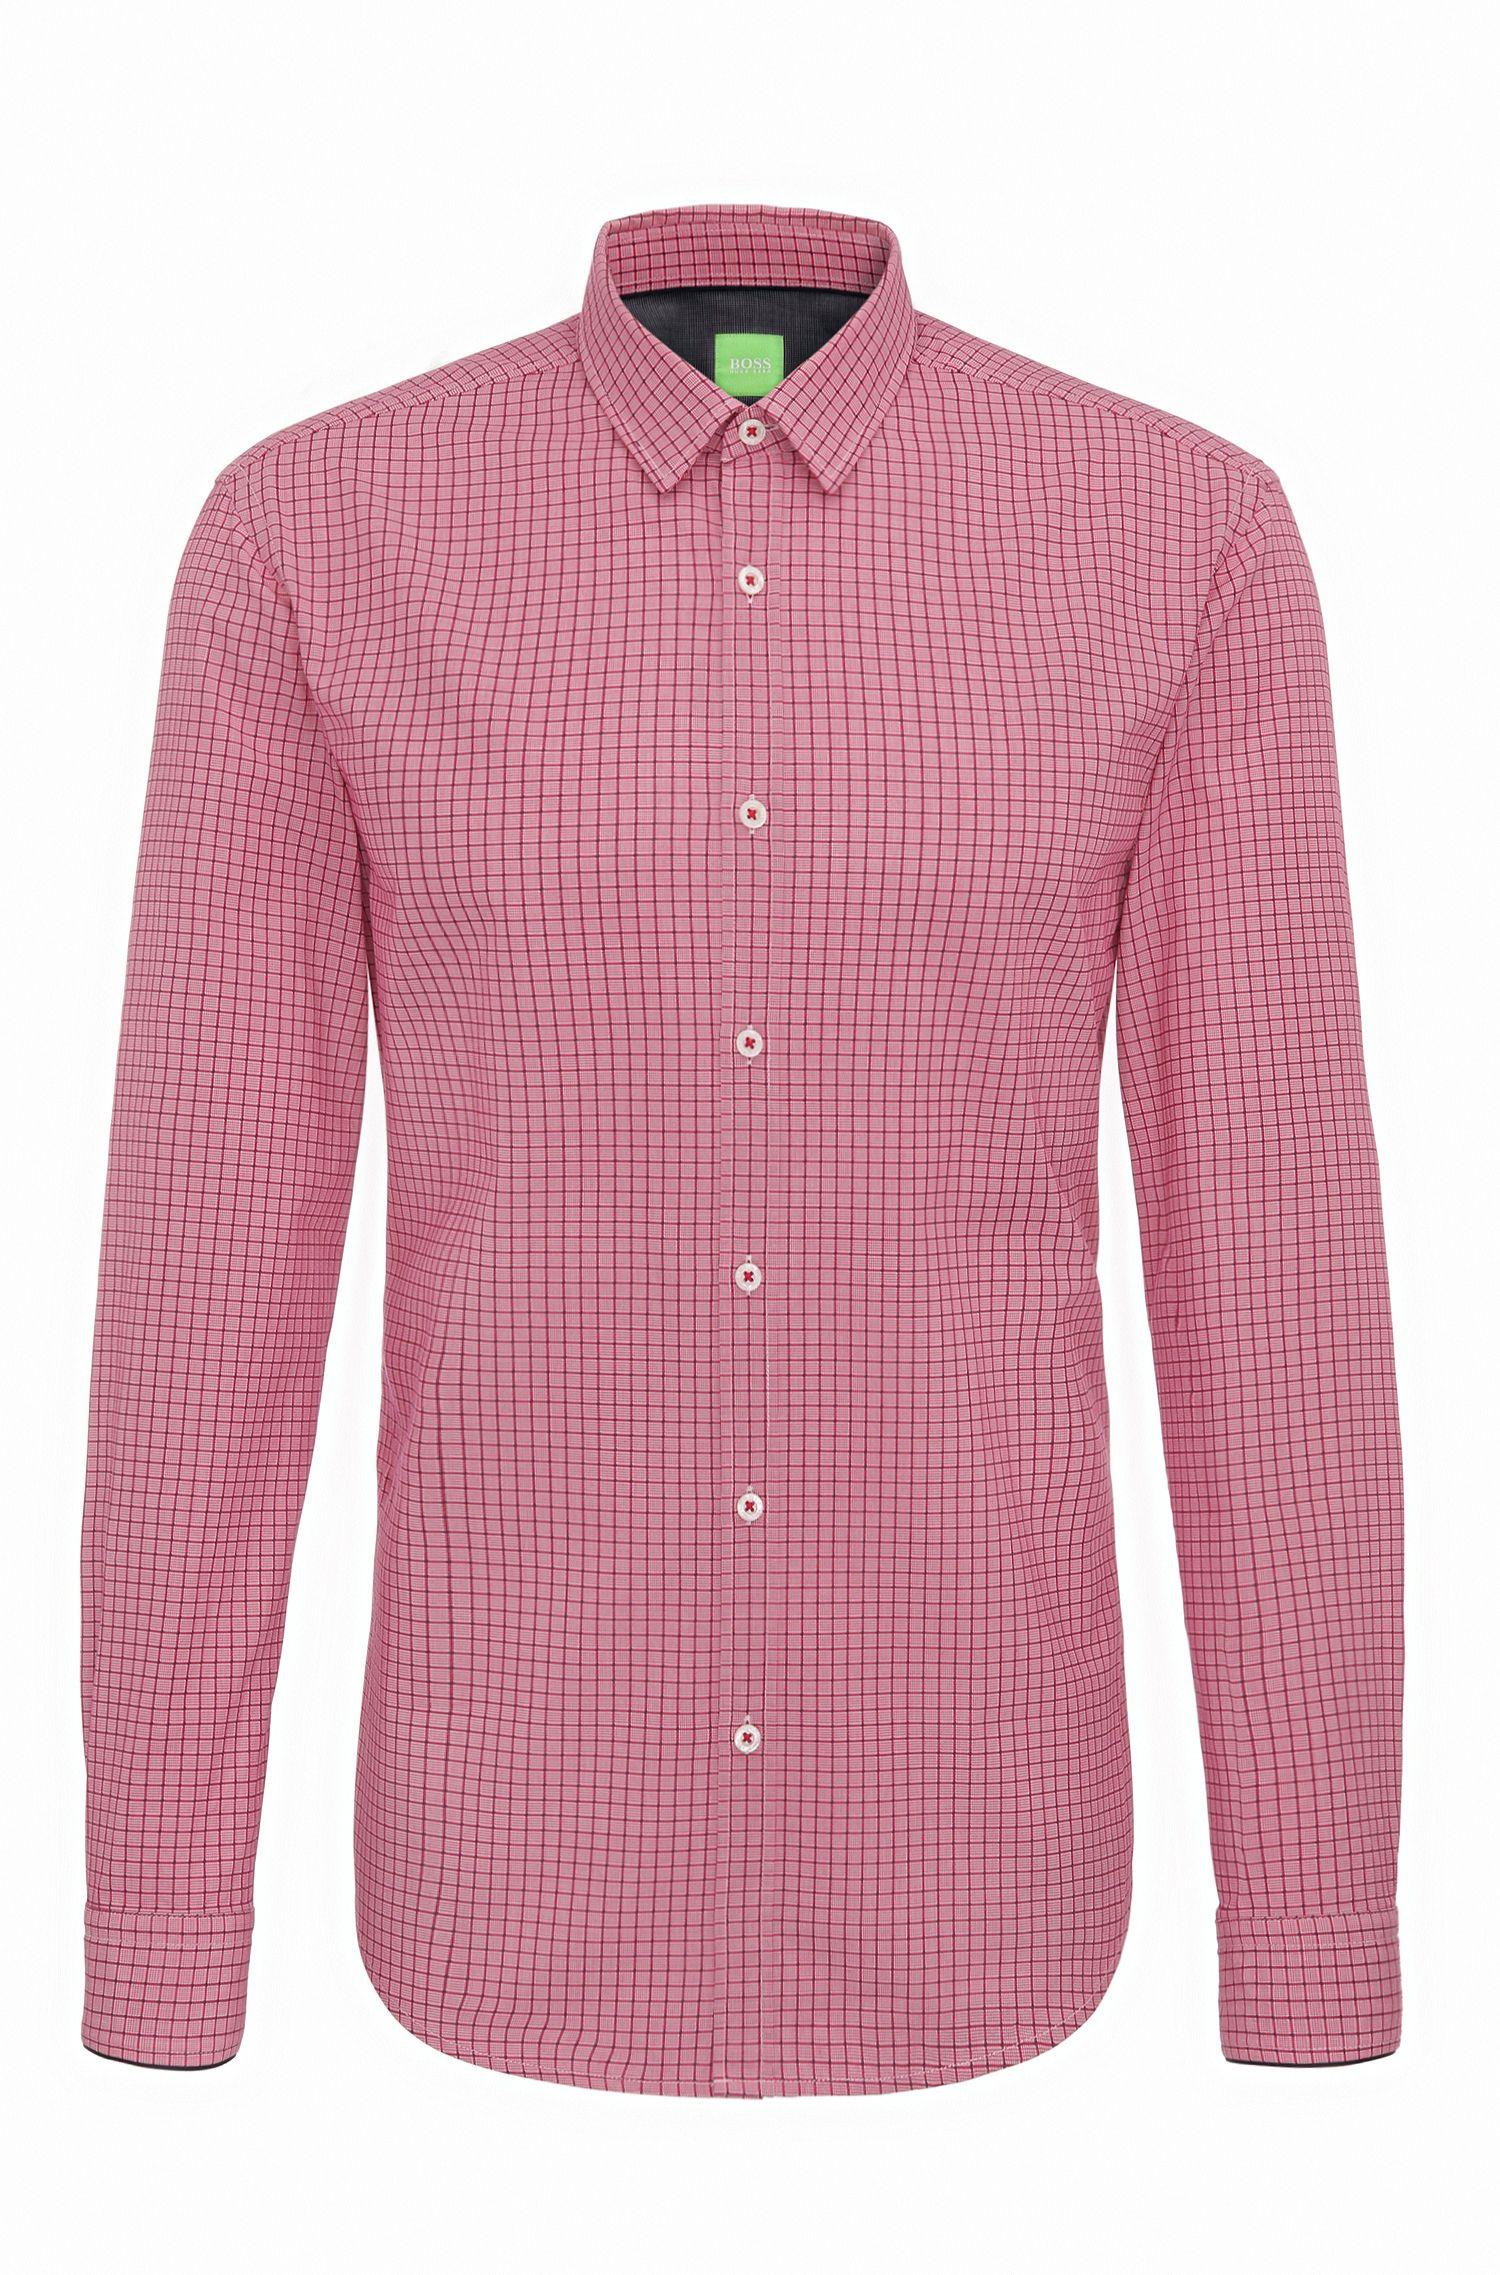 'C-Bia' | Slim Fit, Windowpane Cotton Button-Down Shirt